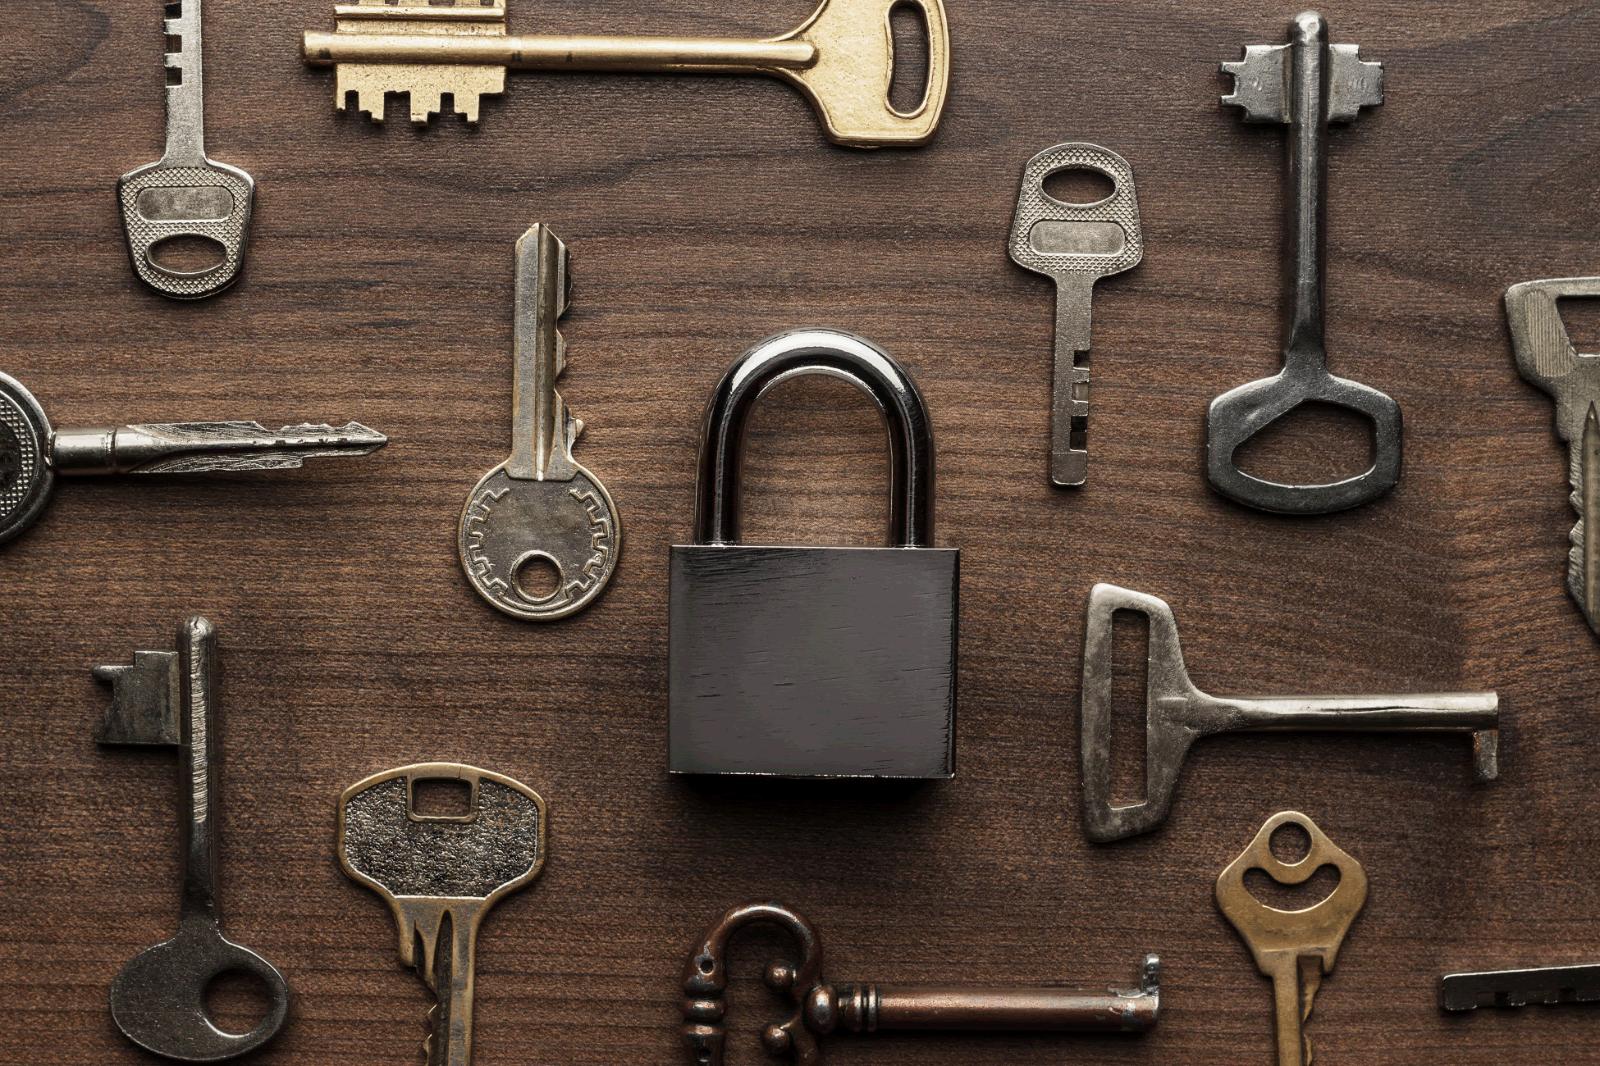 rustic locks and keys background image